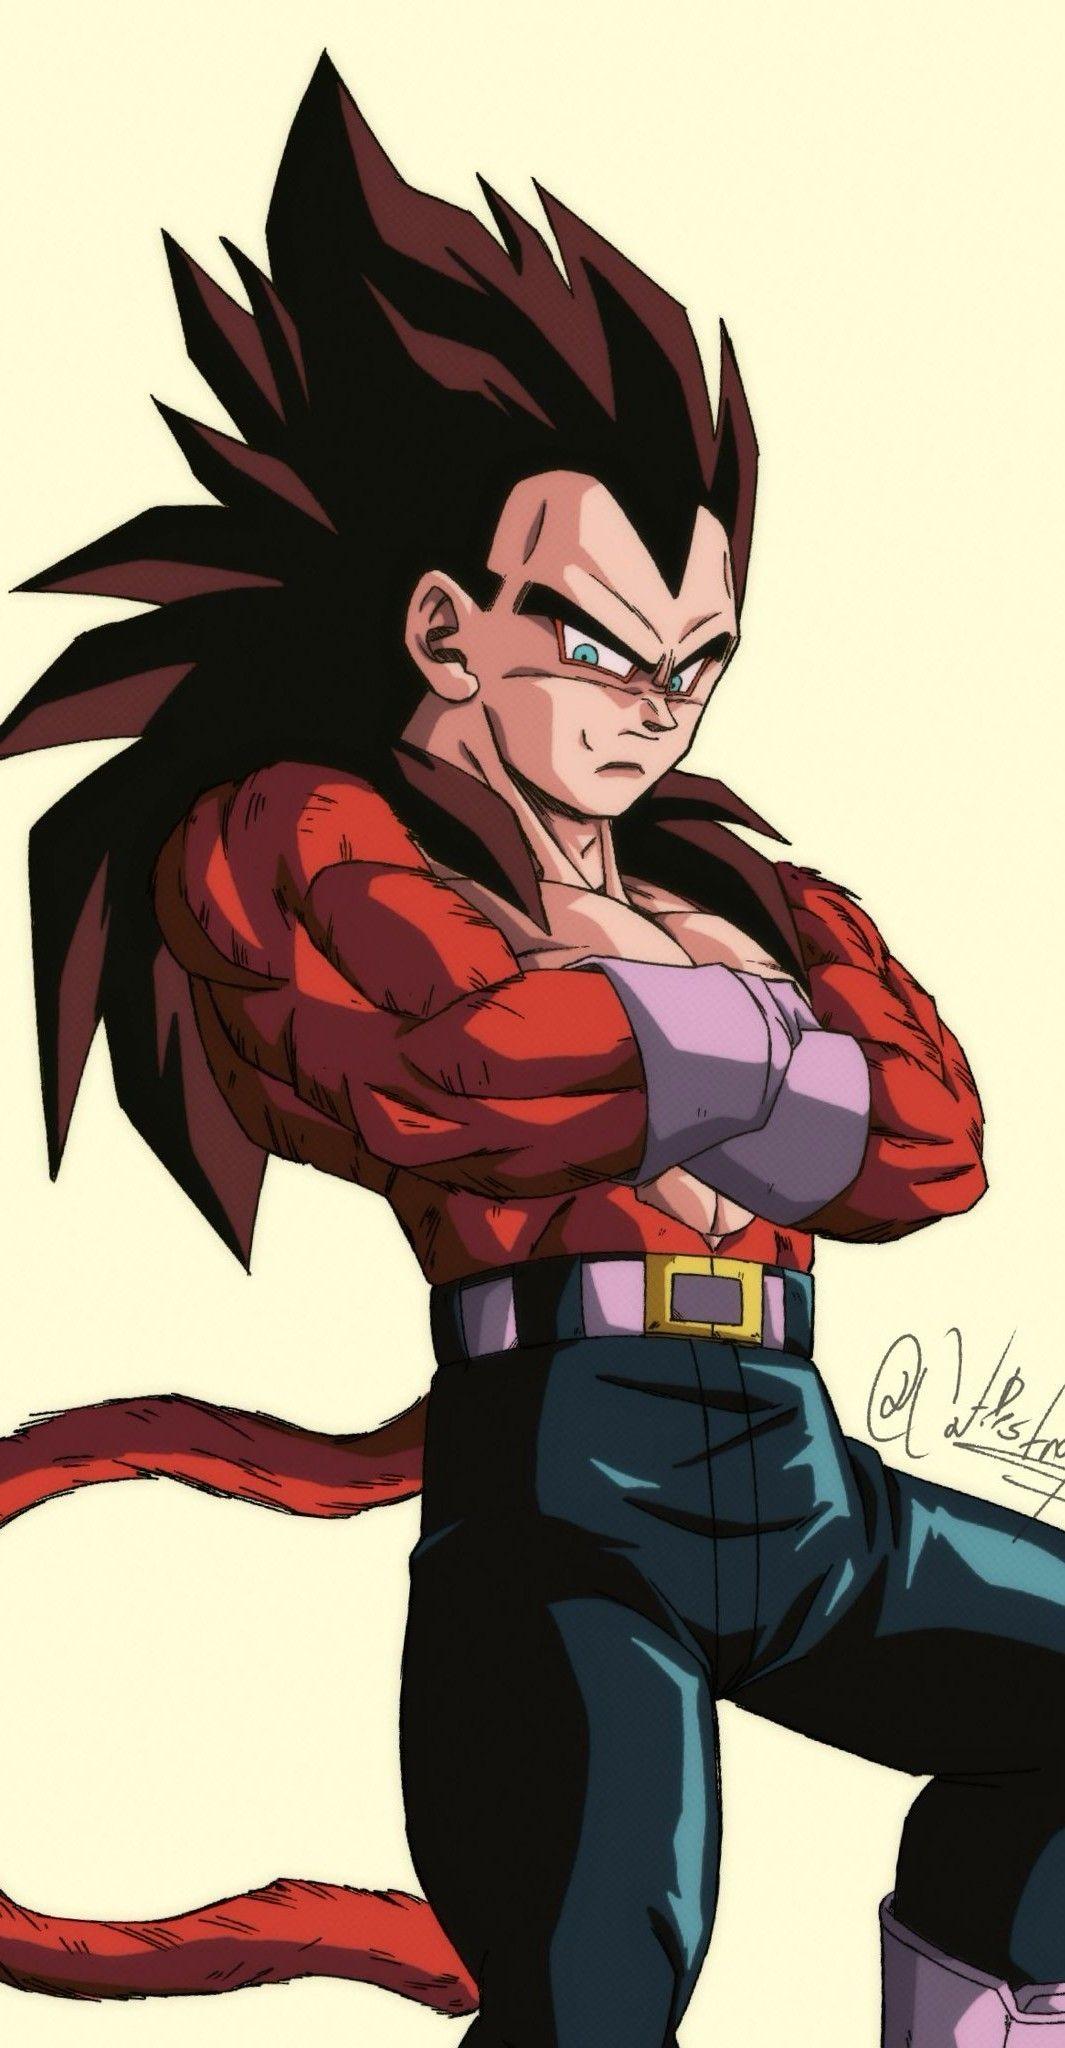 Vegeta Ssj4 By Catdestroyer Personajes De Goku Personajes De Dragon Ball Goku Super Saiyajin 4